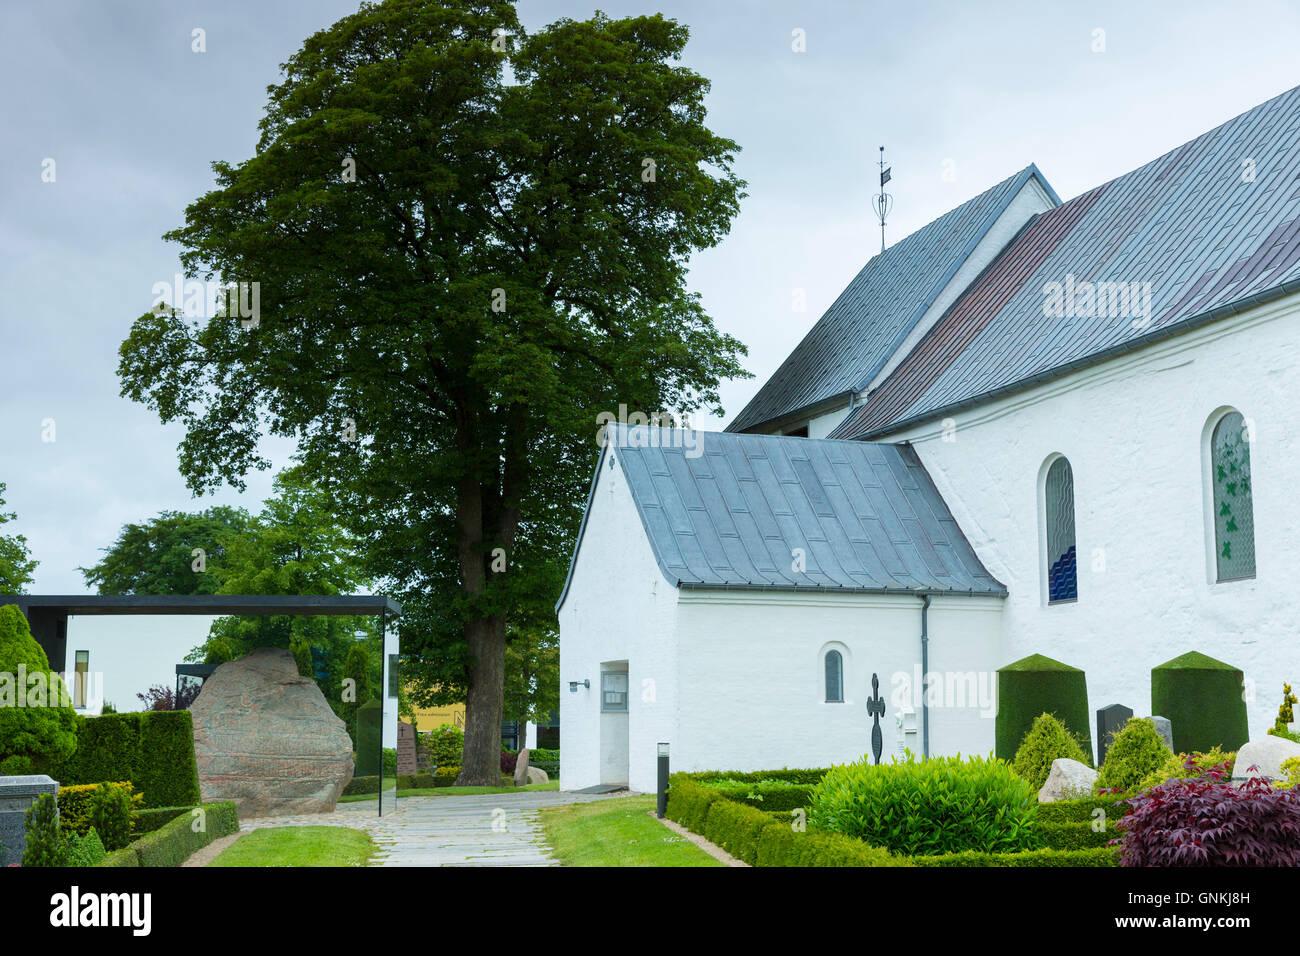 Jelling Kirke church (Gudstjeneste) and Jelling Stones runestones, birthplace of Christianity in Denmark - Stock Image